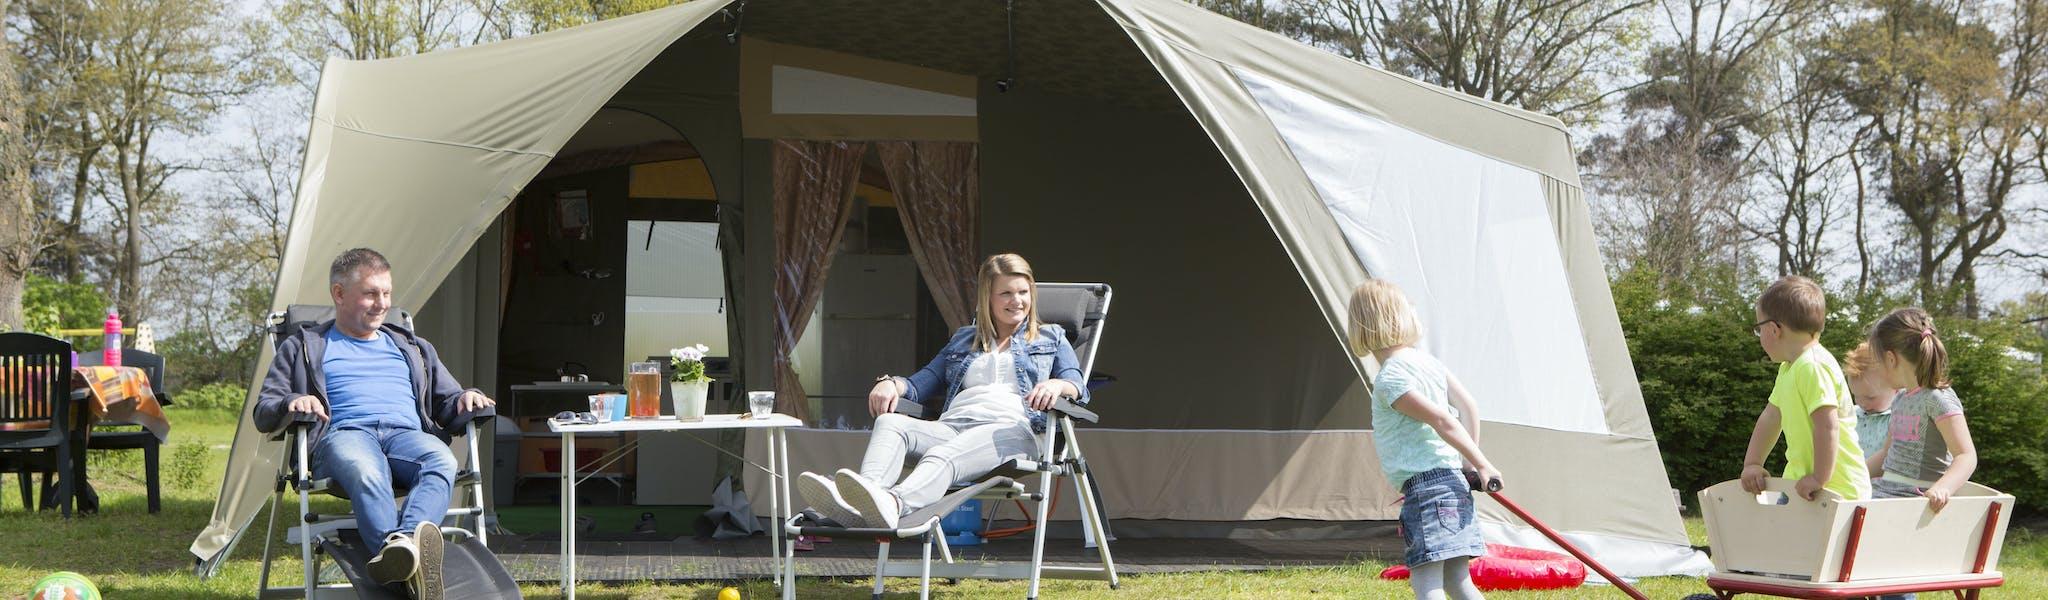 GlamLodge tent model